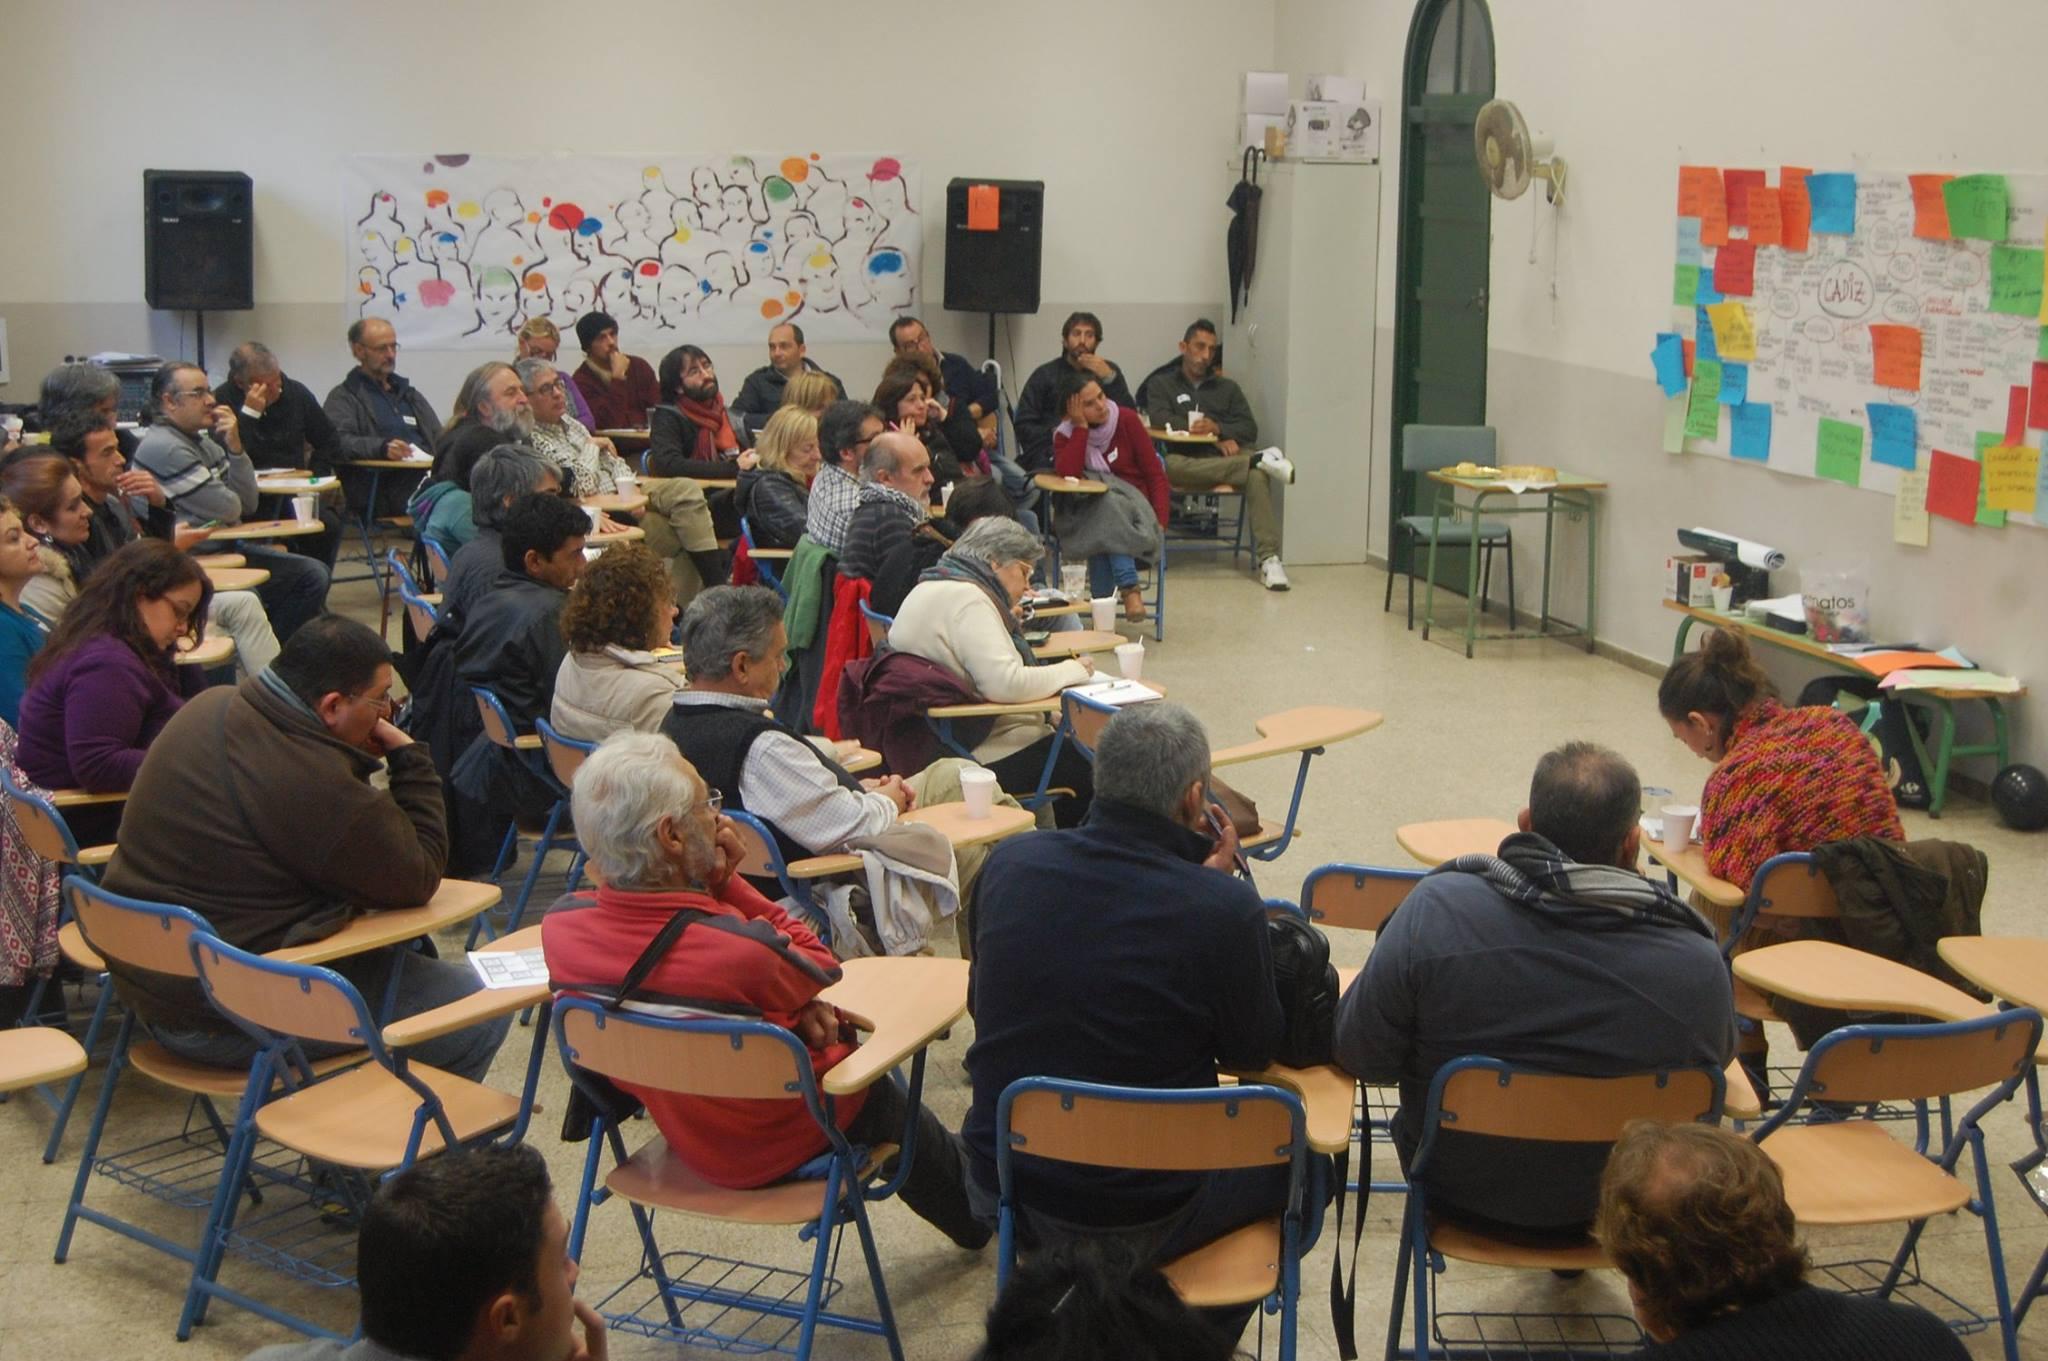 Ganar Cádiz elegirá el 13 de diciembre a la cabecera de su candidatura municipal